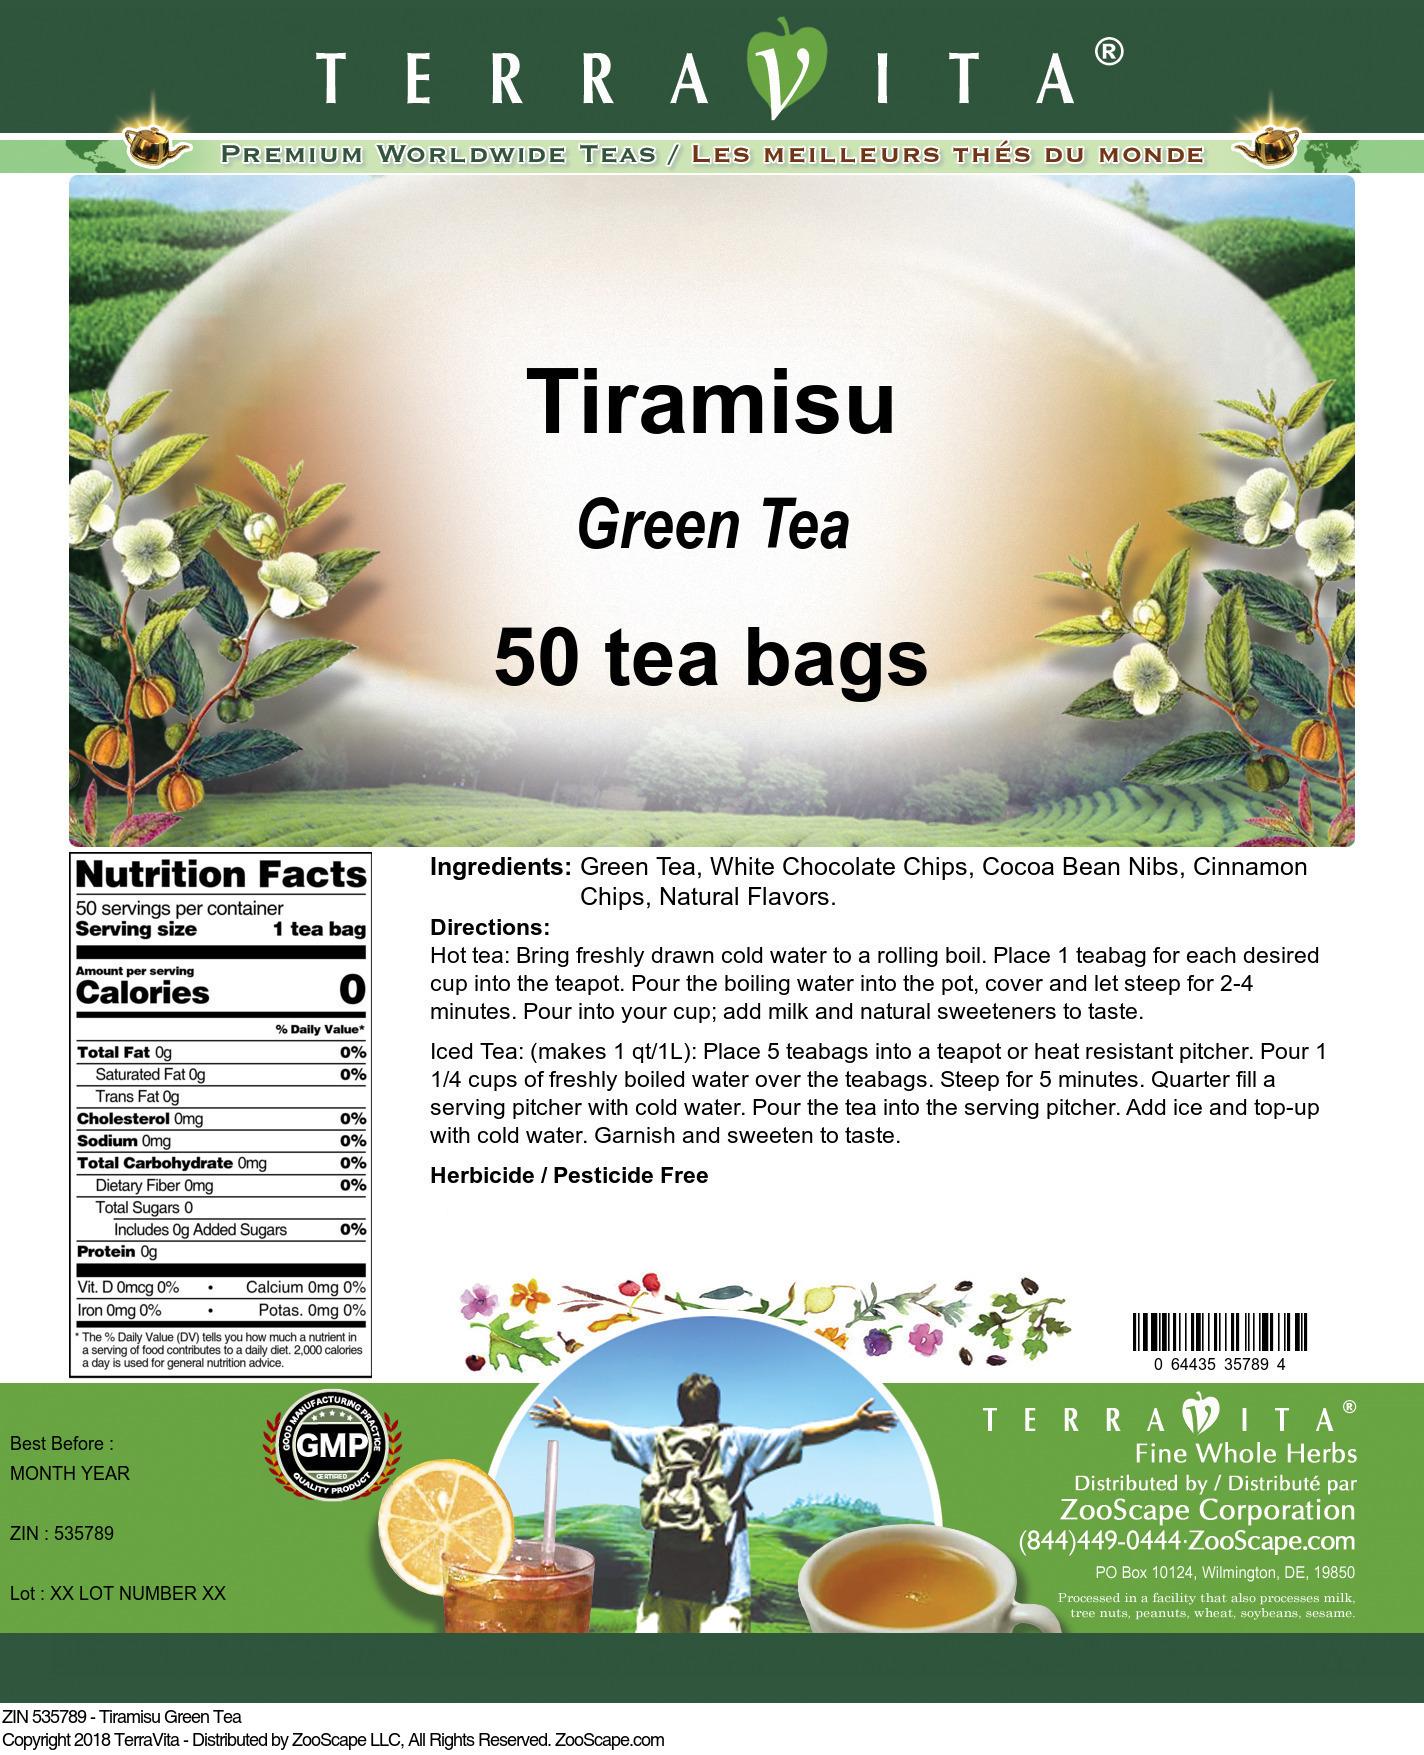 Tiramisu Green Tea